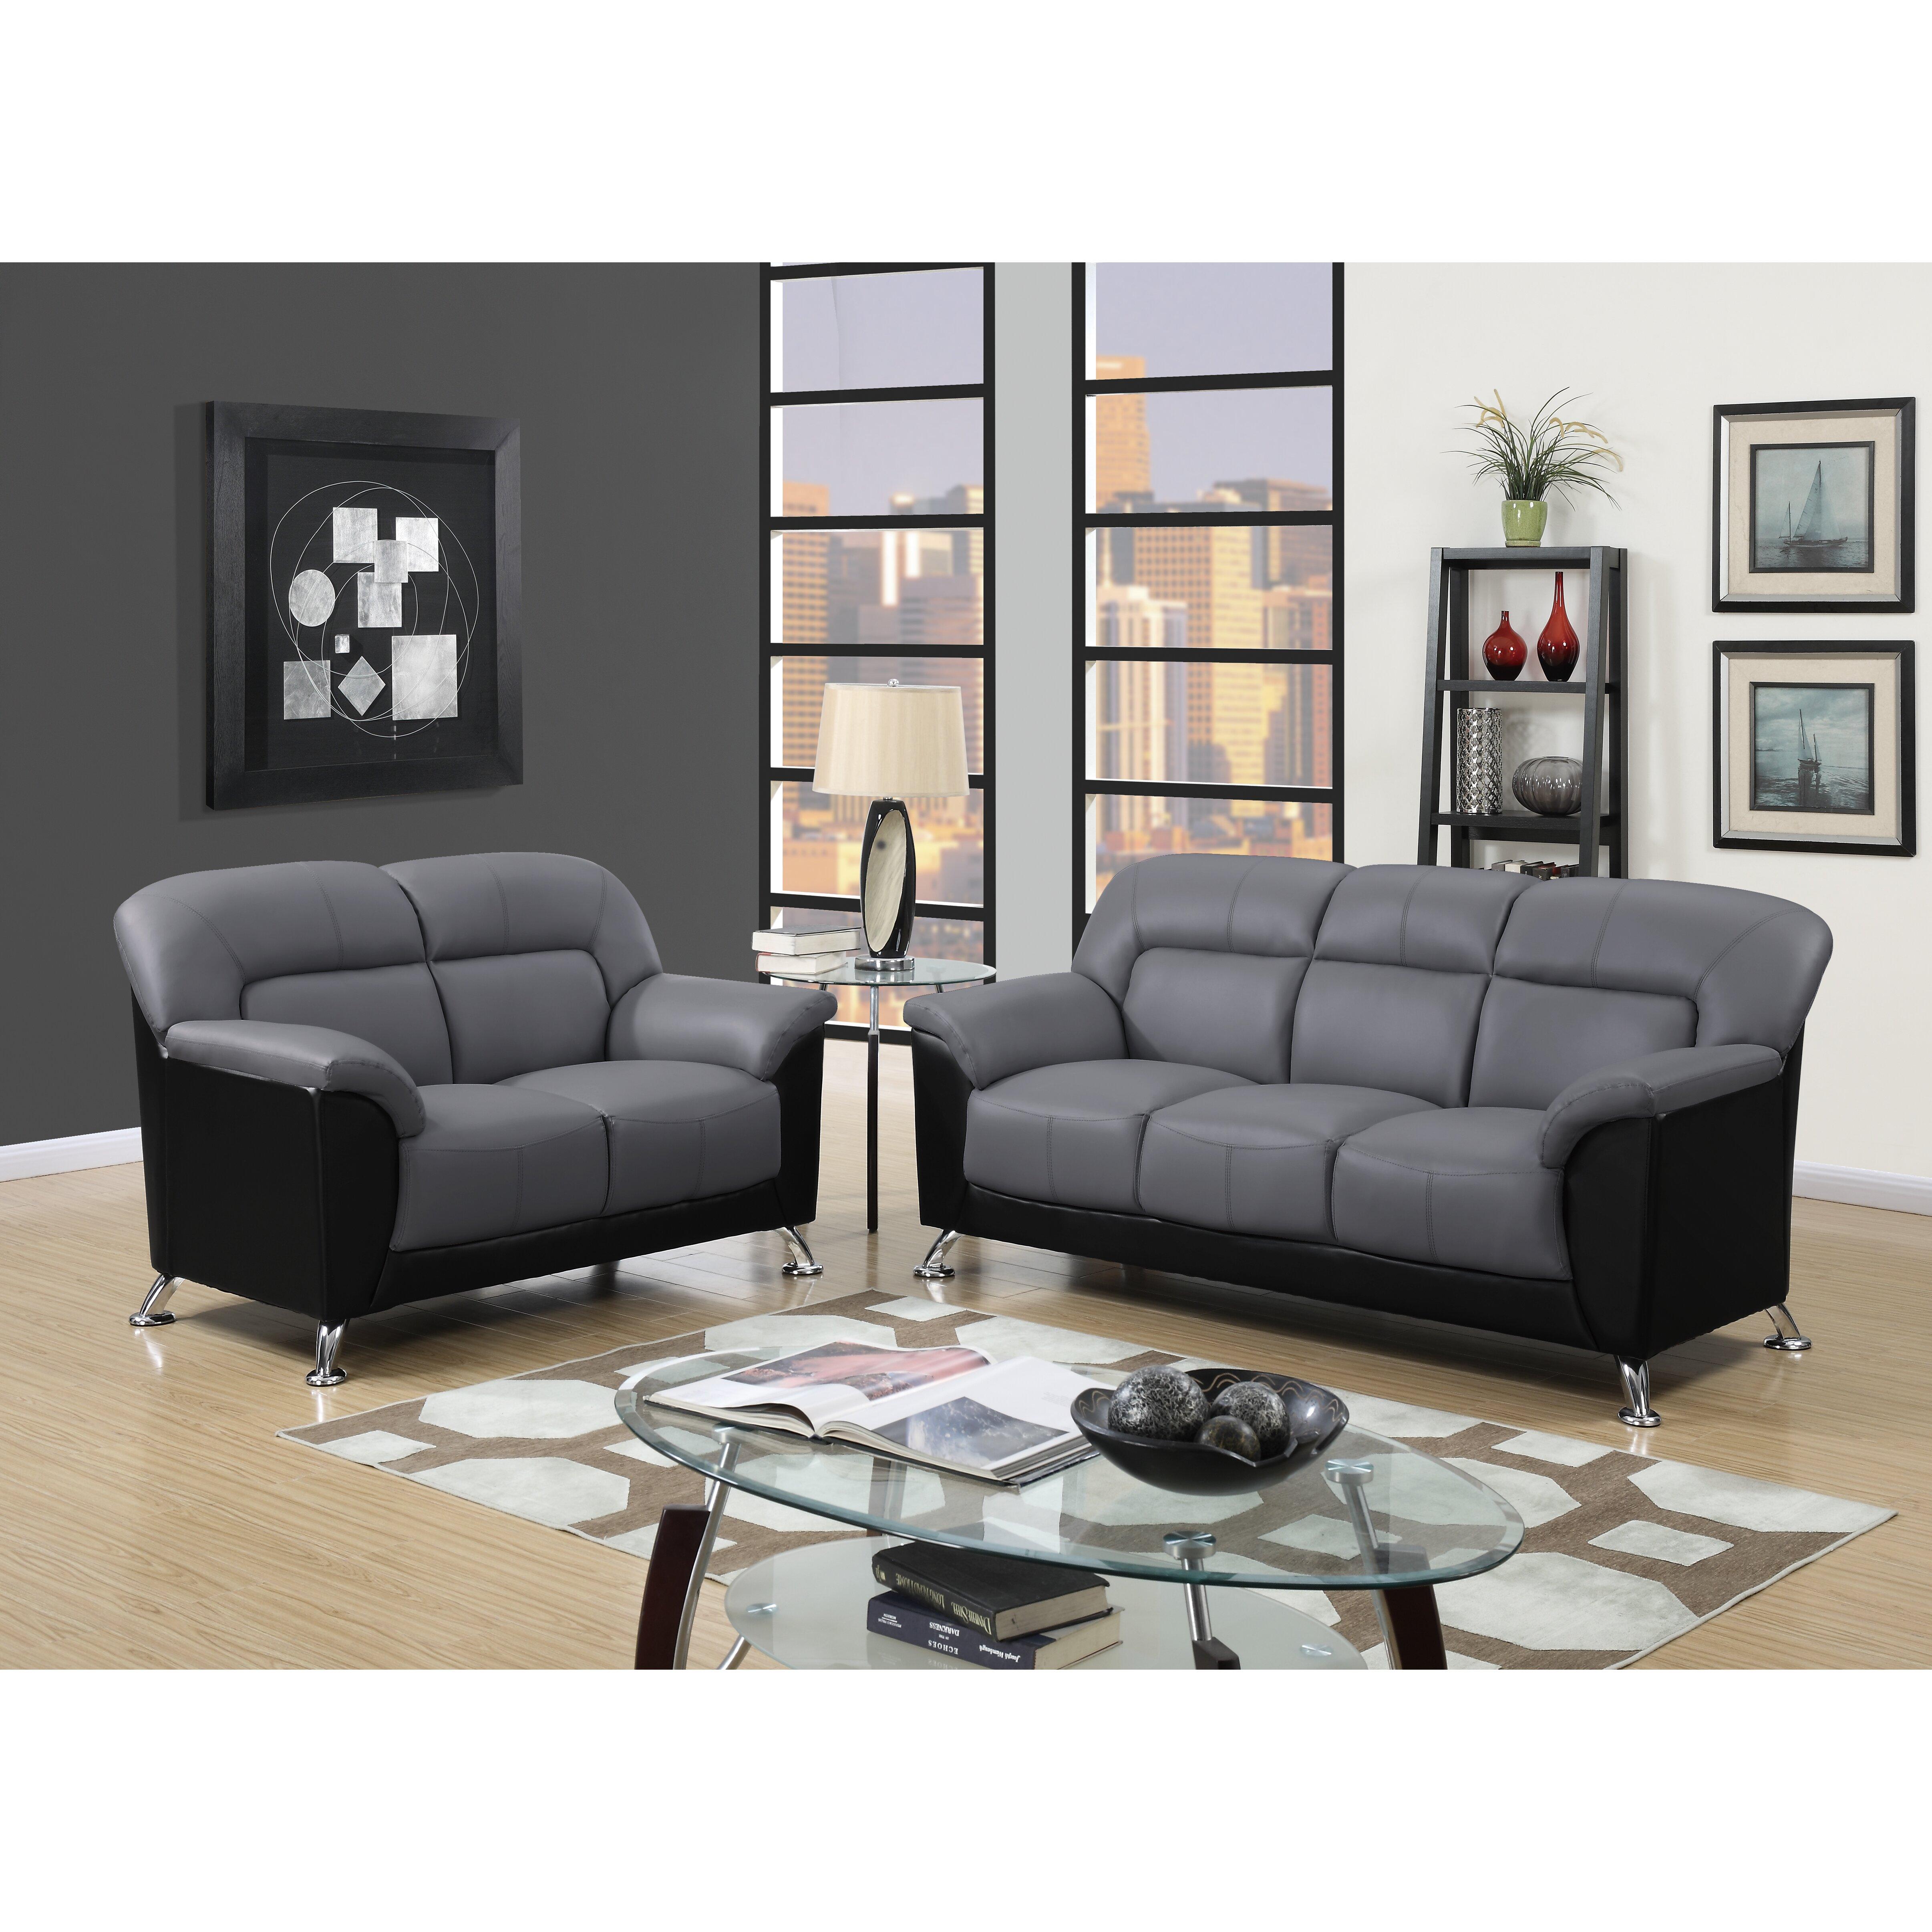 Global furniture usa sofa for Divan furniture usa